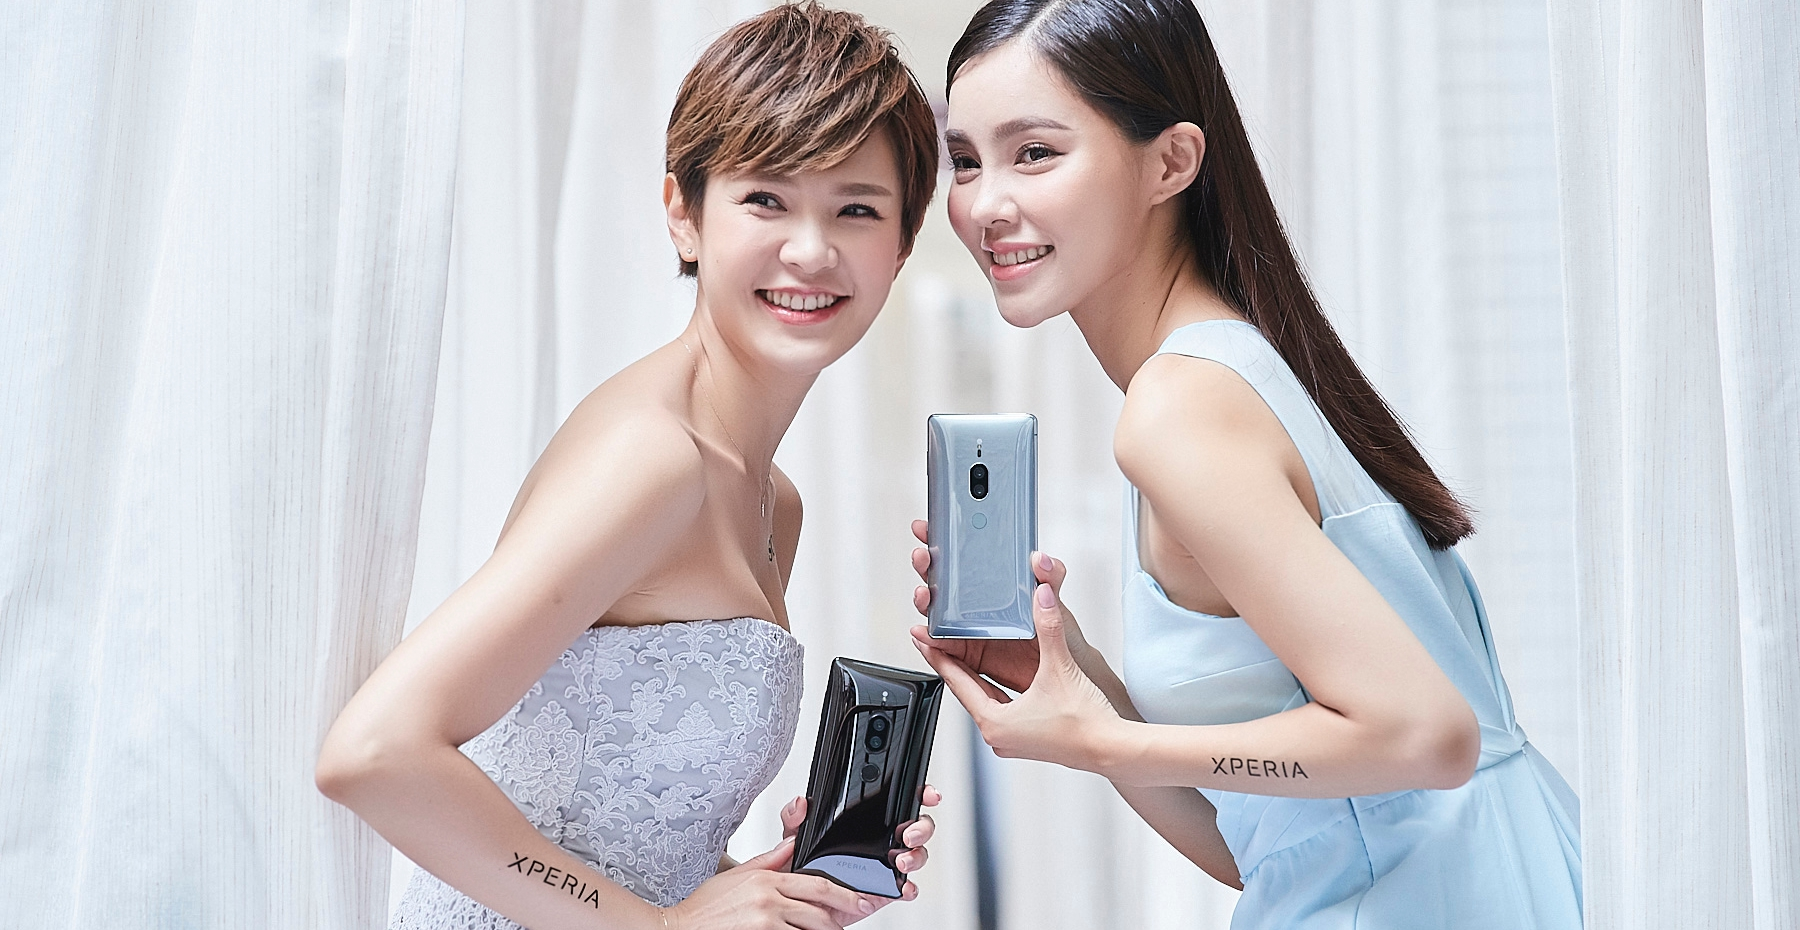 Sony Xperia XZ2 Premium 中華電信開賣!699 上網吃到飽、加送國內通話費